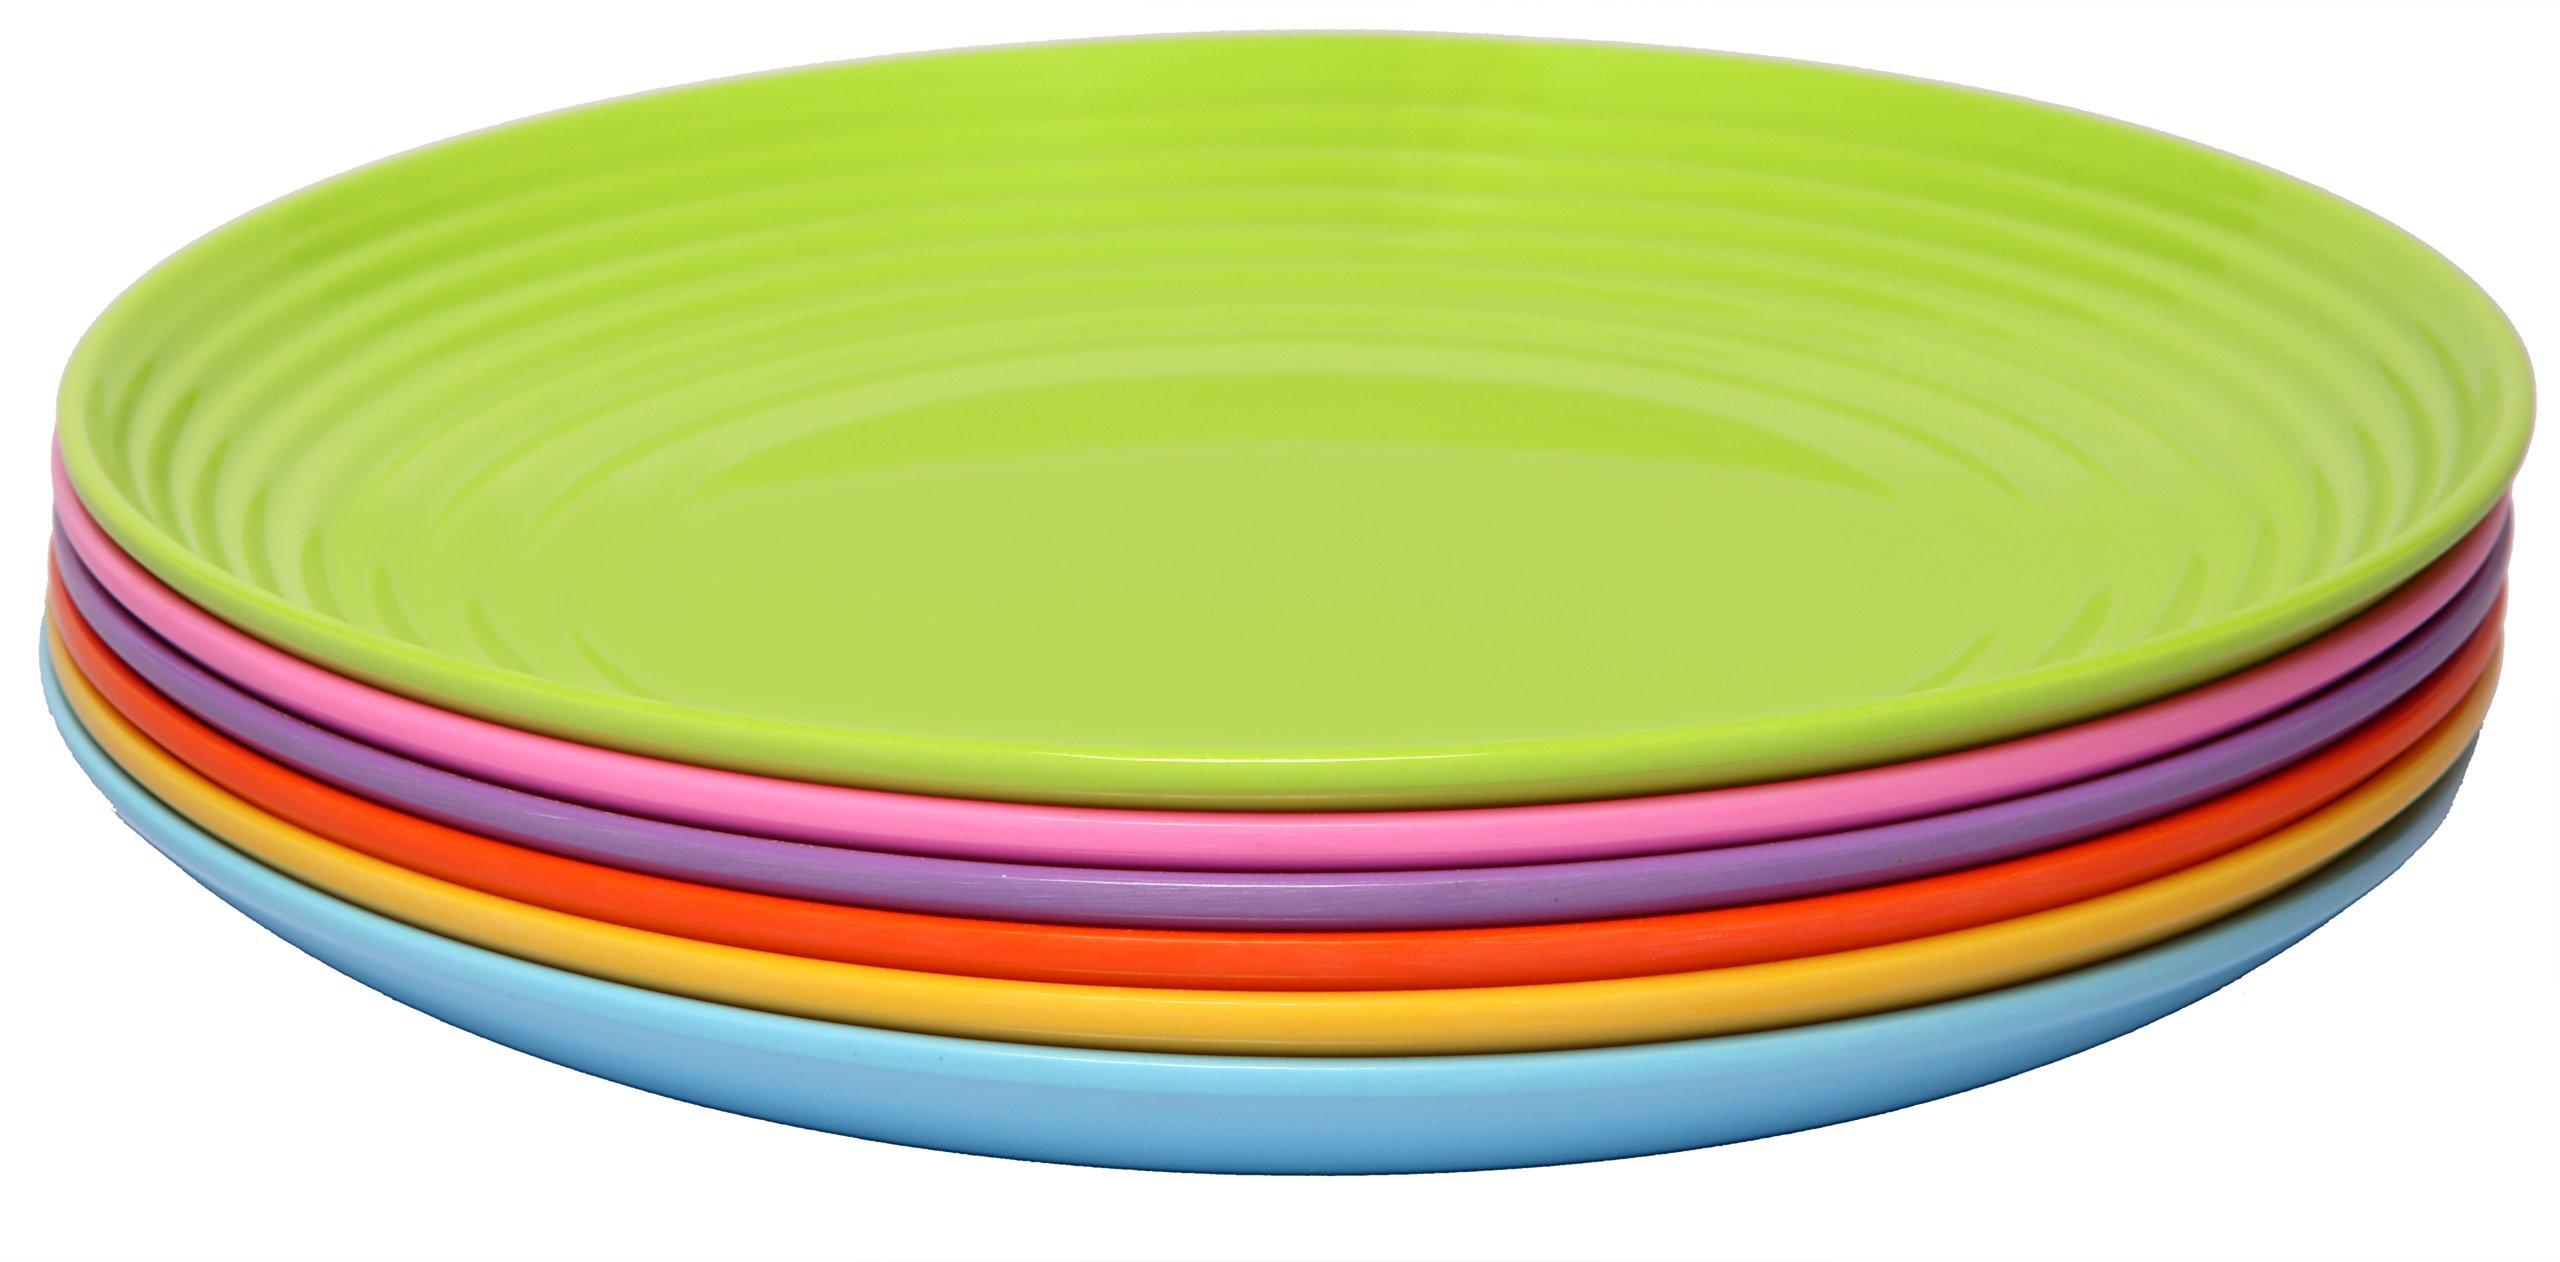 cheap melamine kids plates find melamine kids plates deals on line